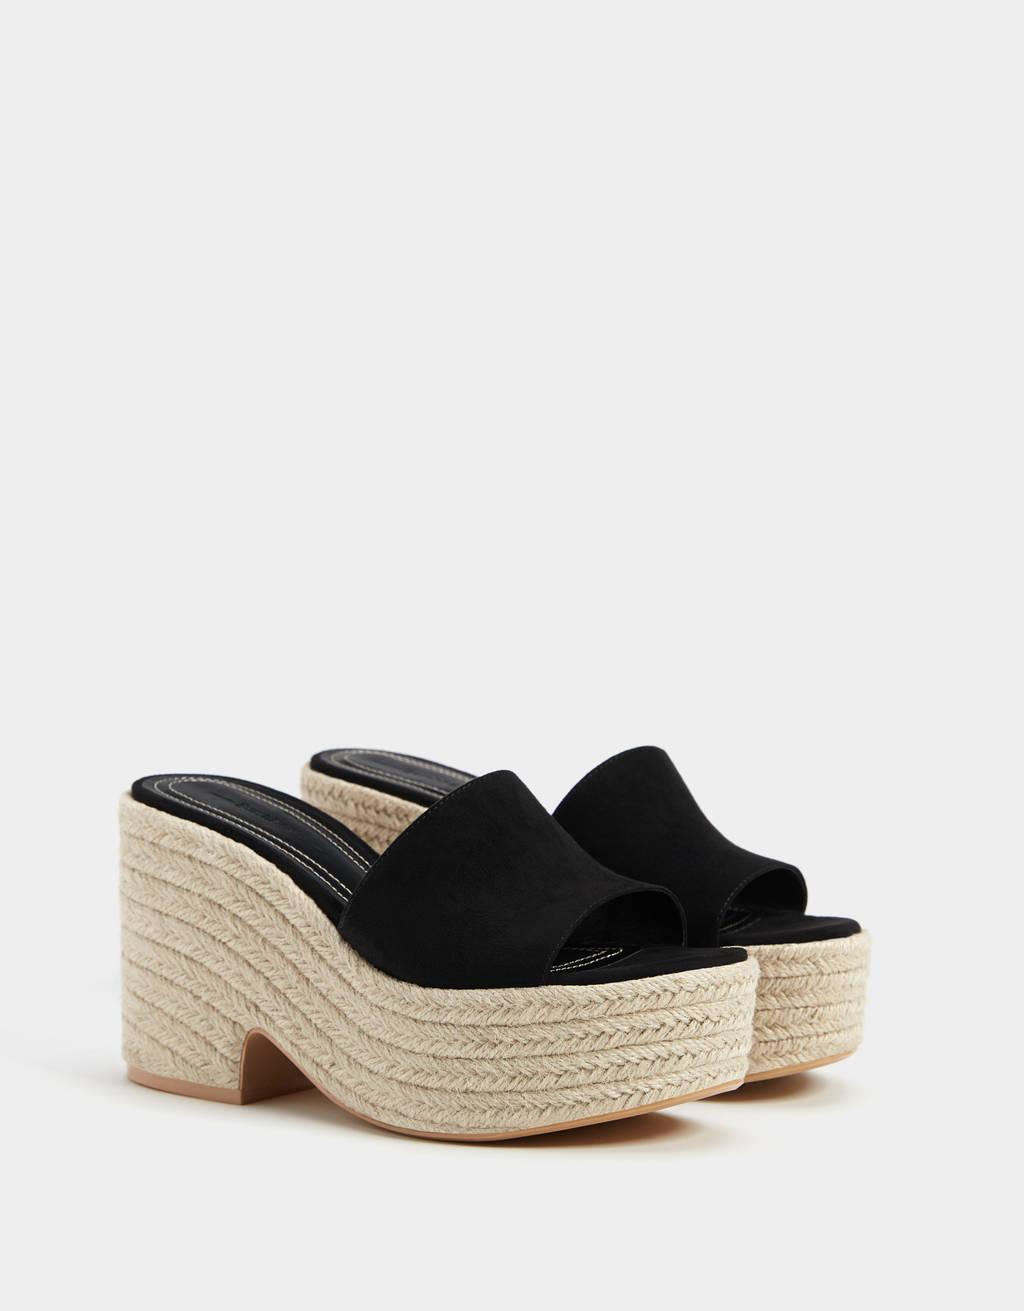 Jute platform sandals - Heeled Sandals